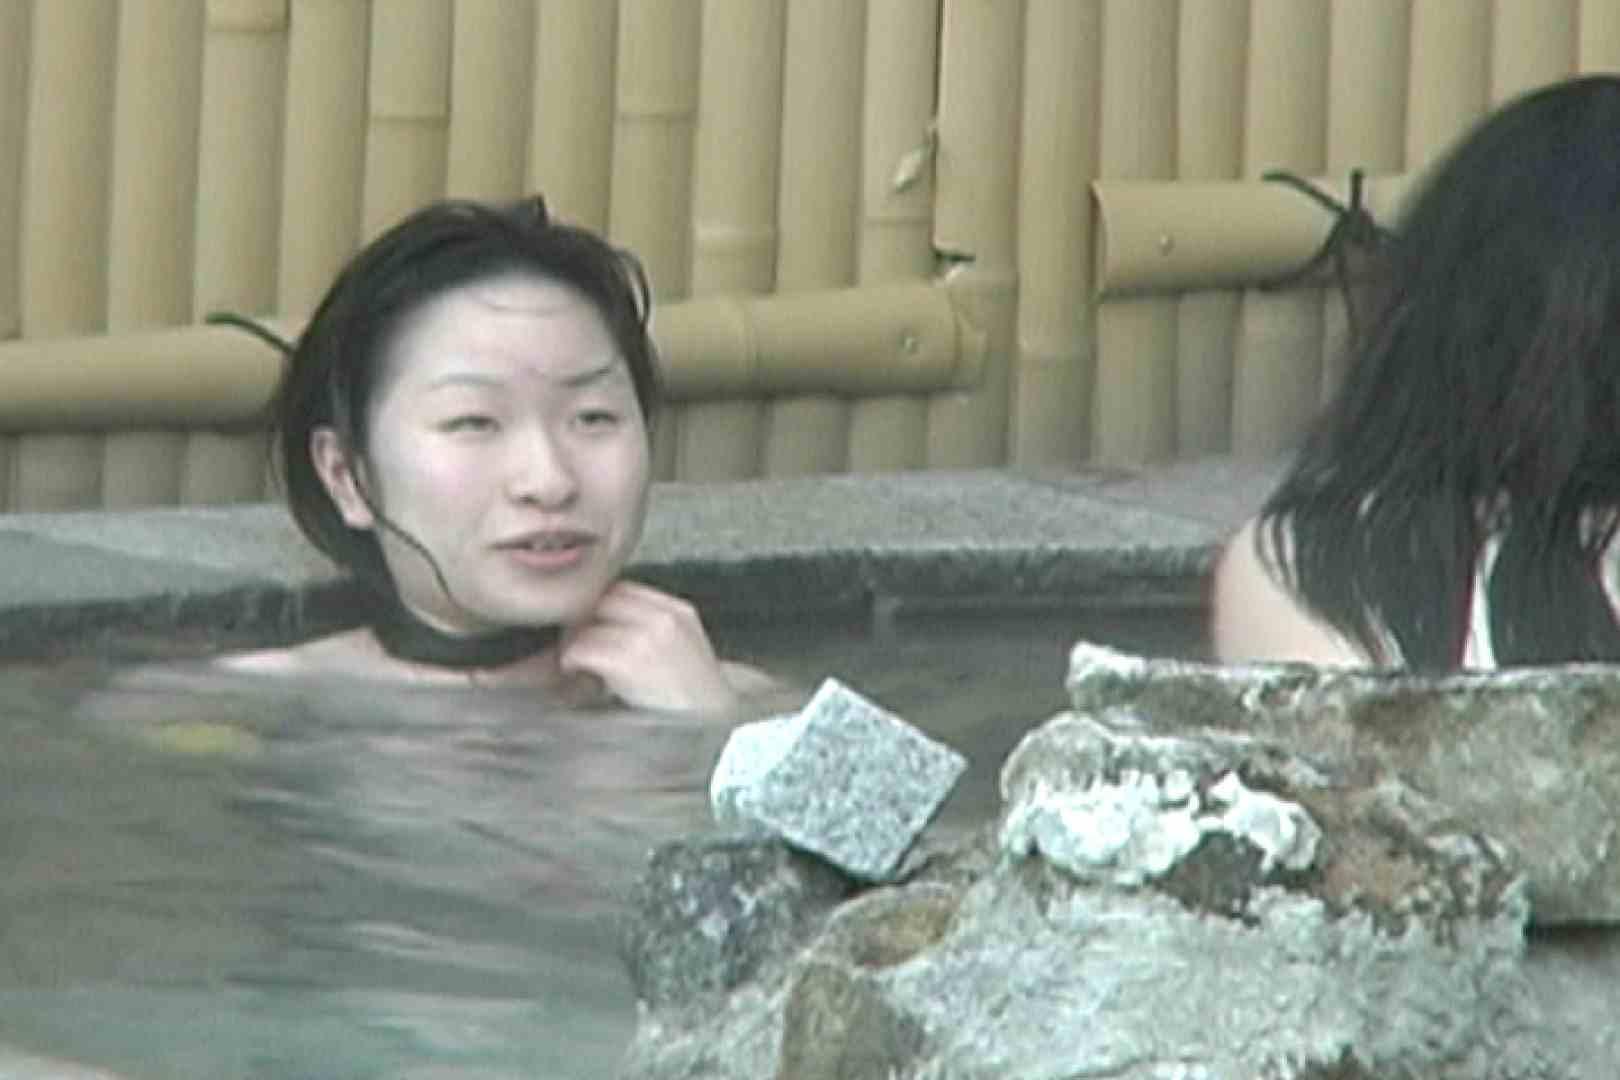 Aquaな露天風呂Vol.595 HなOL | 露天  65pic 56